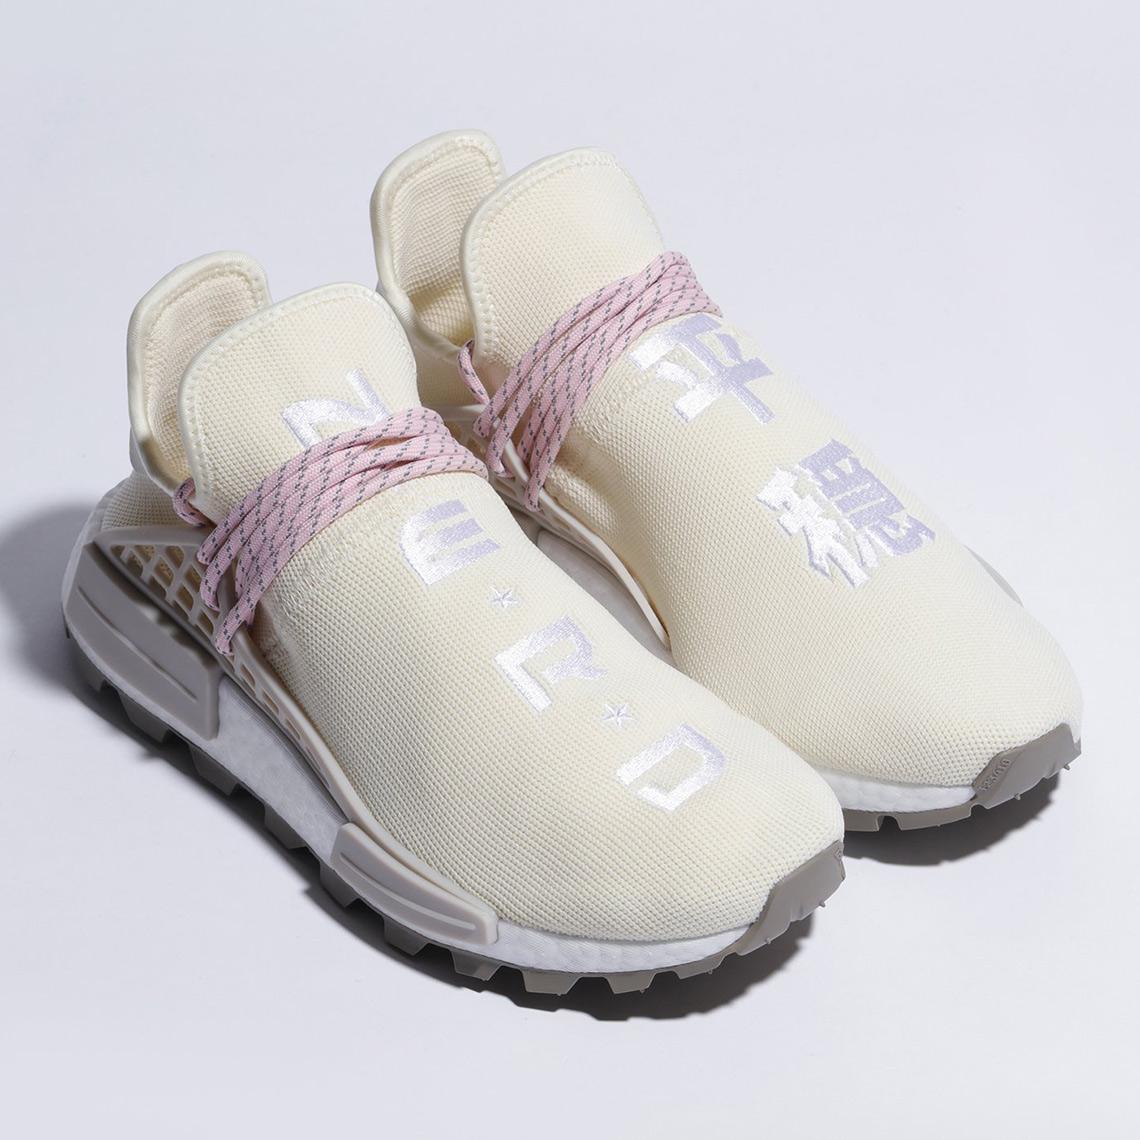 118b84d2a Pharrell adidas NMD Hu NERD Cream White Pink EE8102